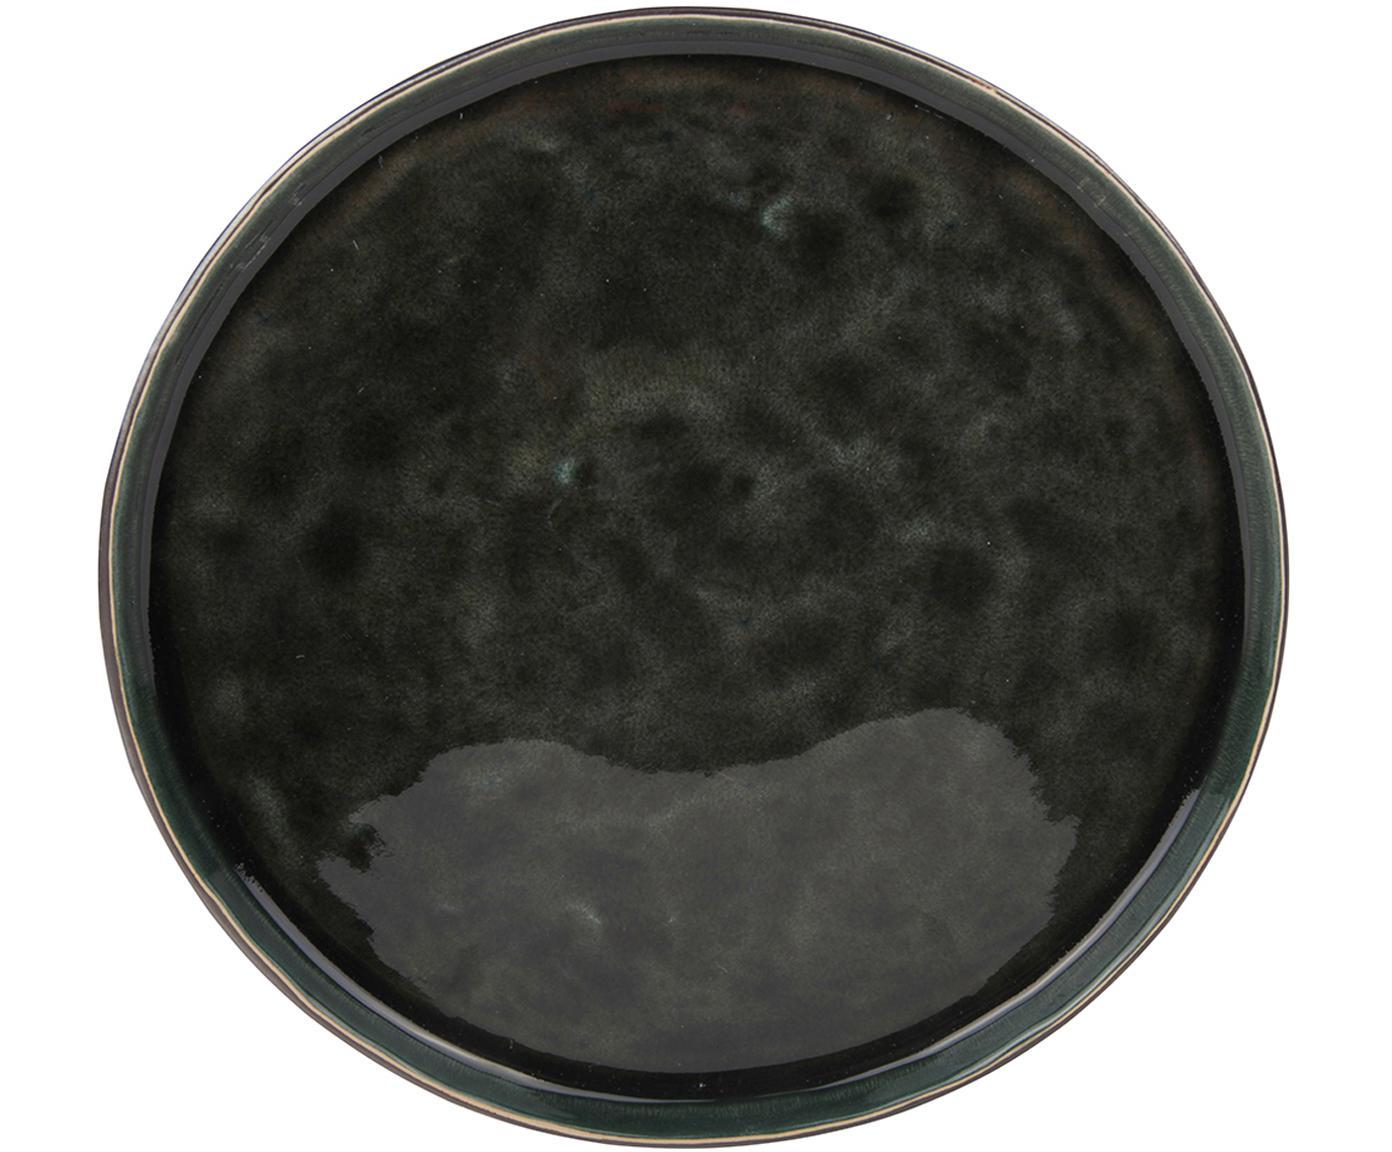 Piatto da colazione Lagune 6 pz, Ceramica, Marrone grigiastro, nero verde, Ø 22 cm